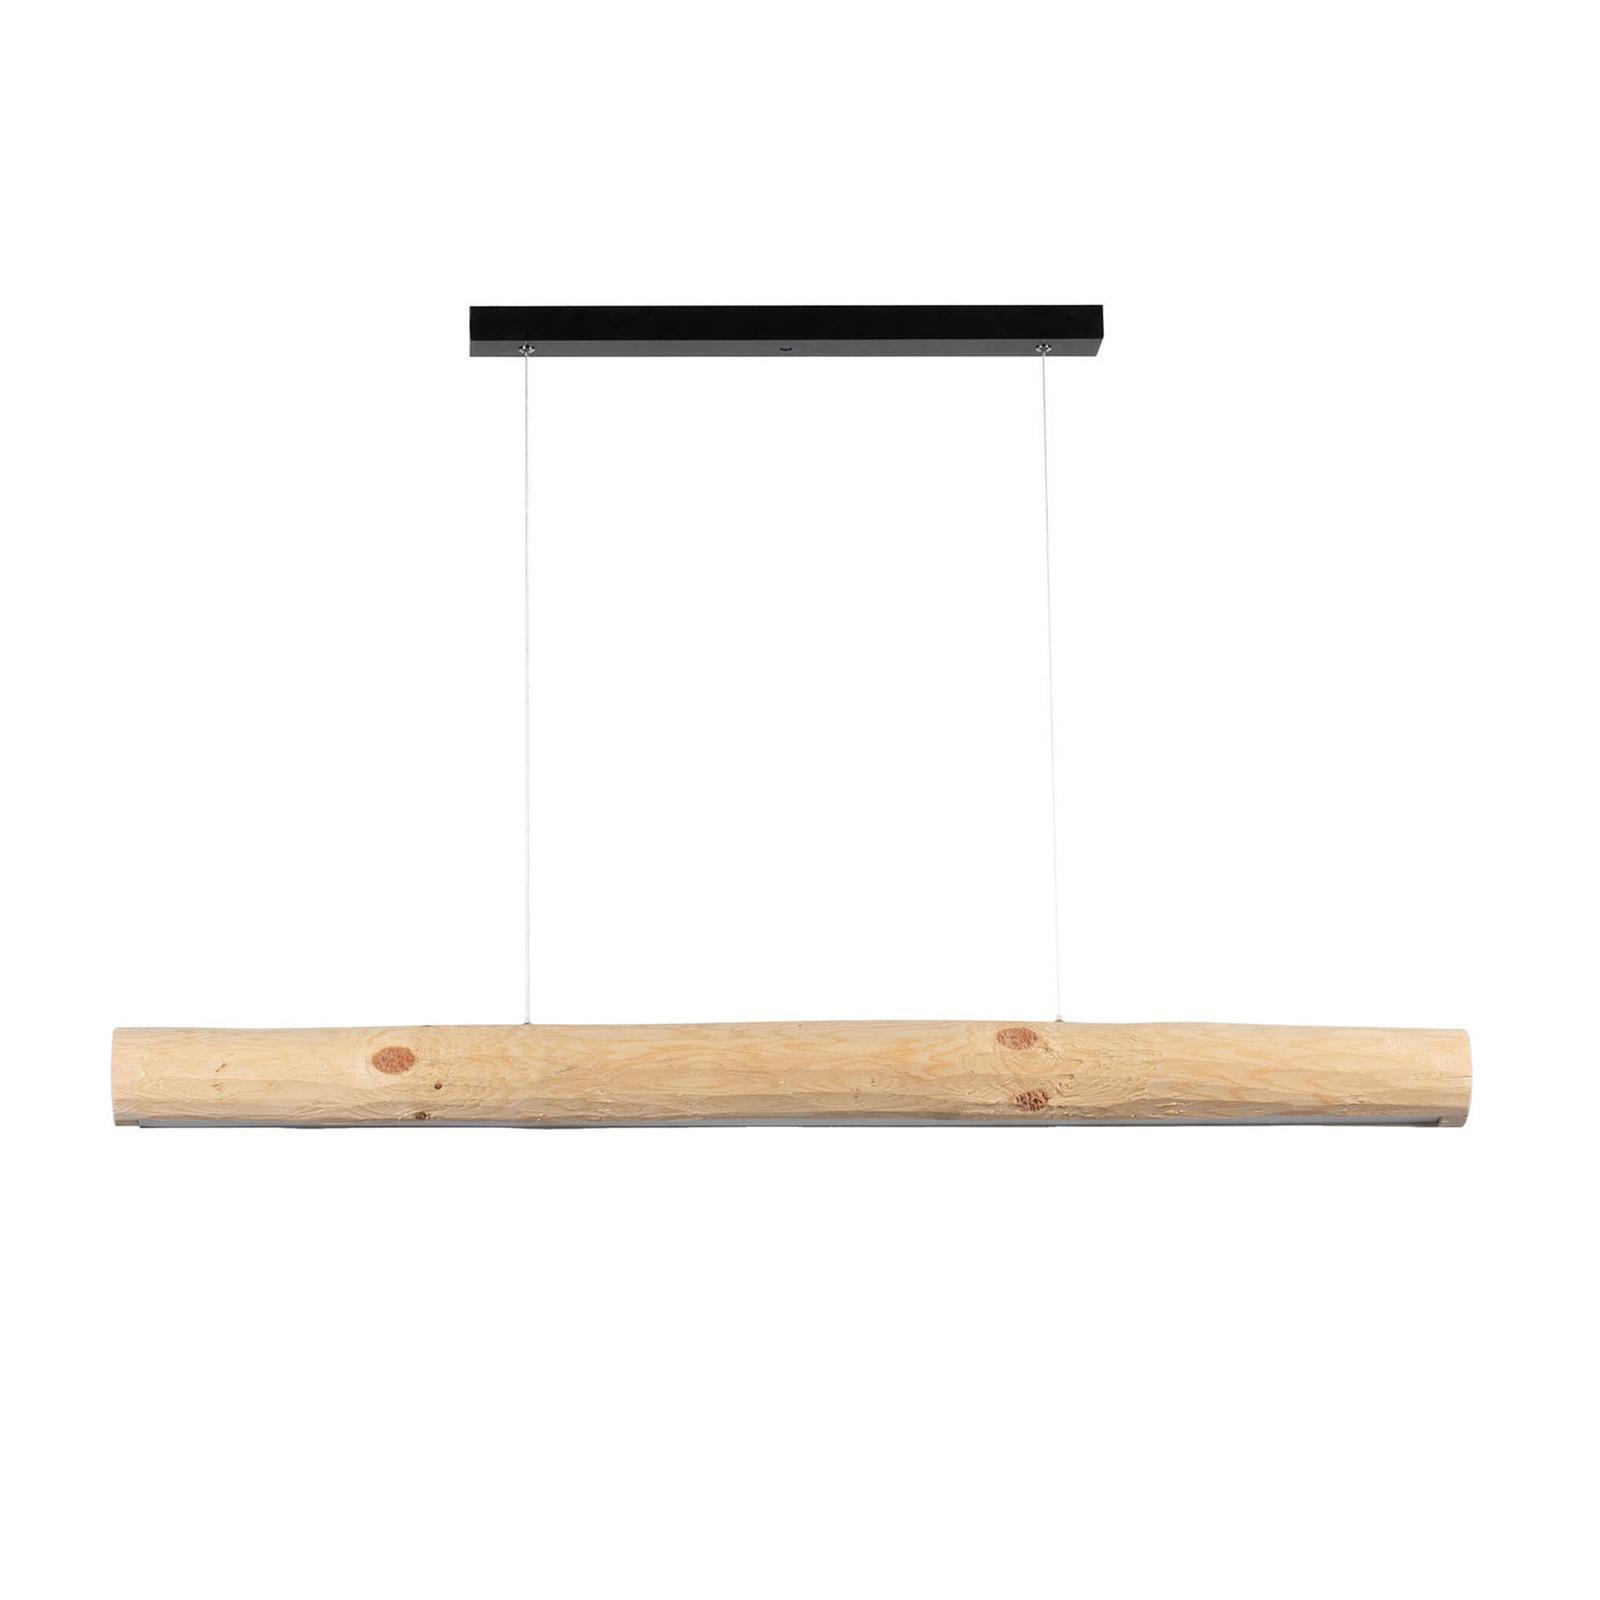 Hengelampe Lucas, naturlig furutre, 115 cm lang